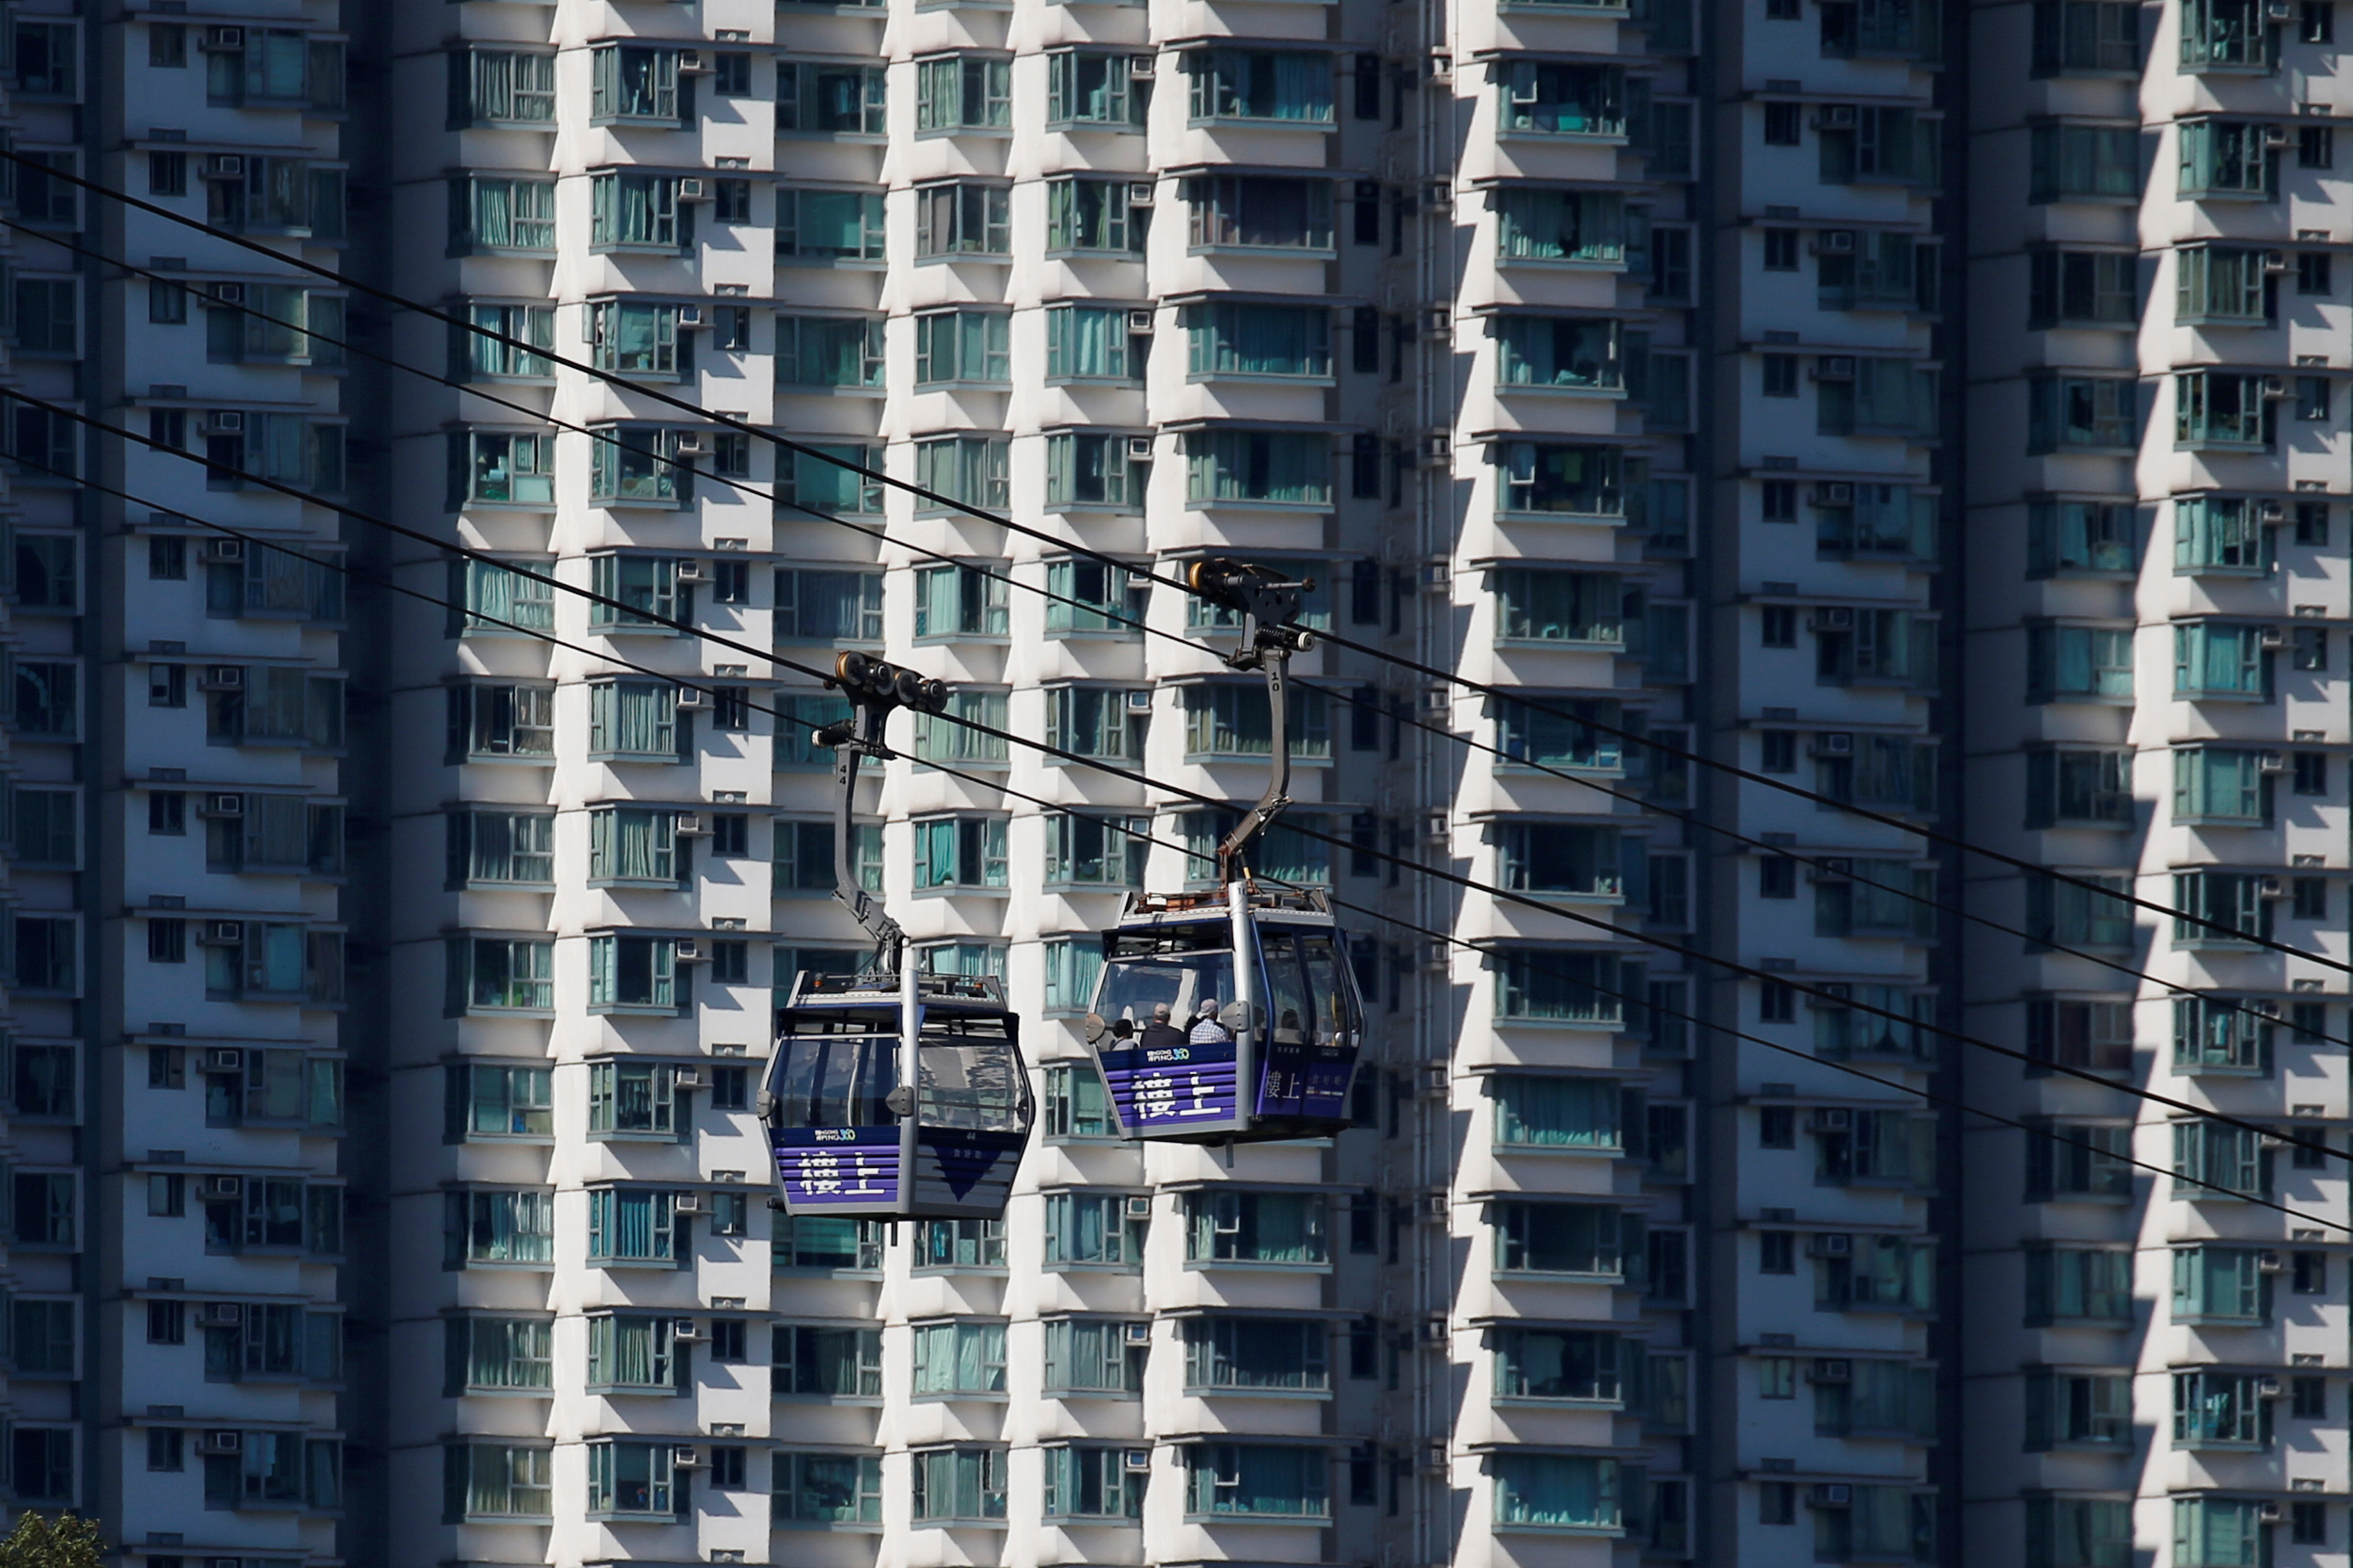 Cable cars move past residential flats at Lantau island in Hong Kong, China May 30, 2018. Picture taken May 30, 2018.     REUTERS/Bobby Yip